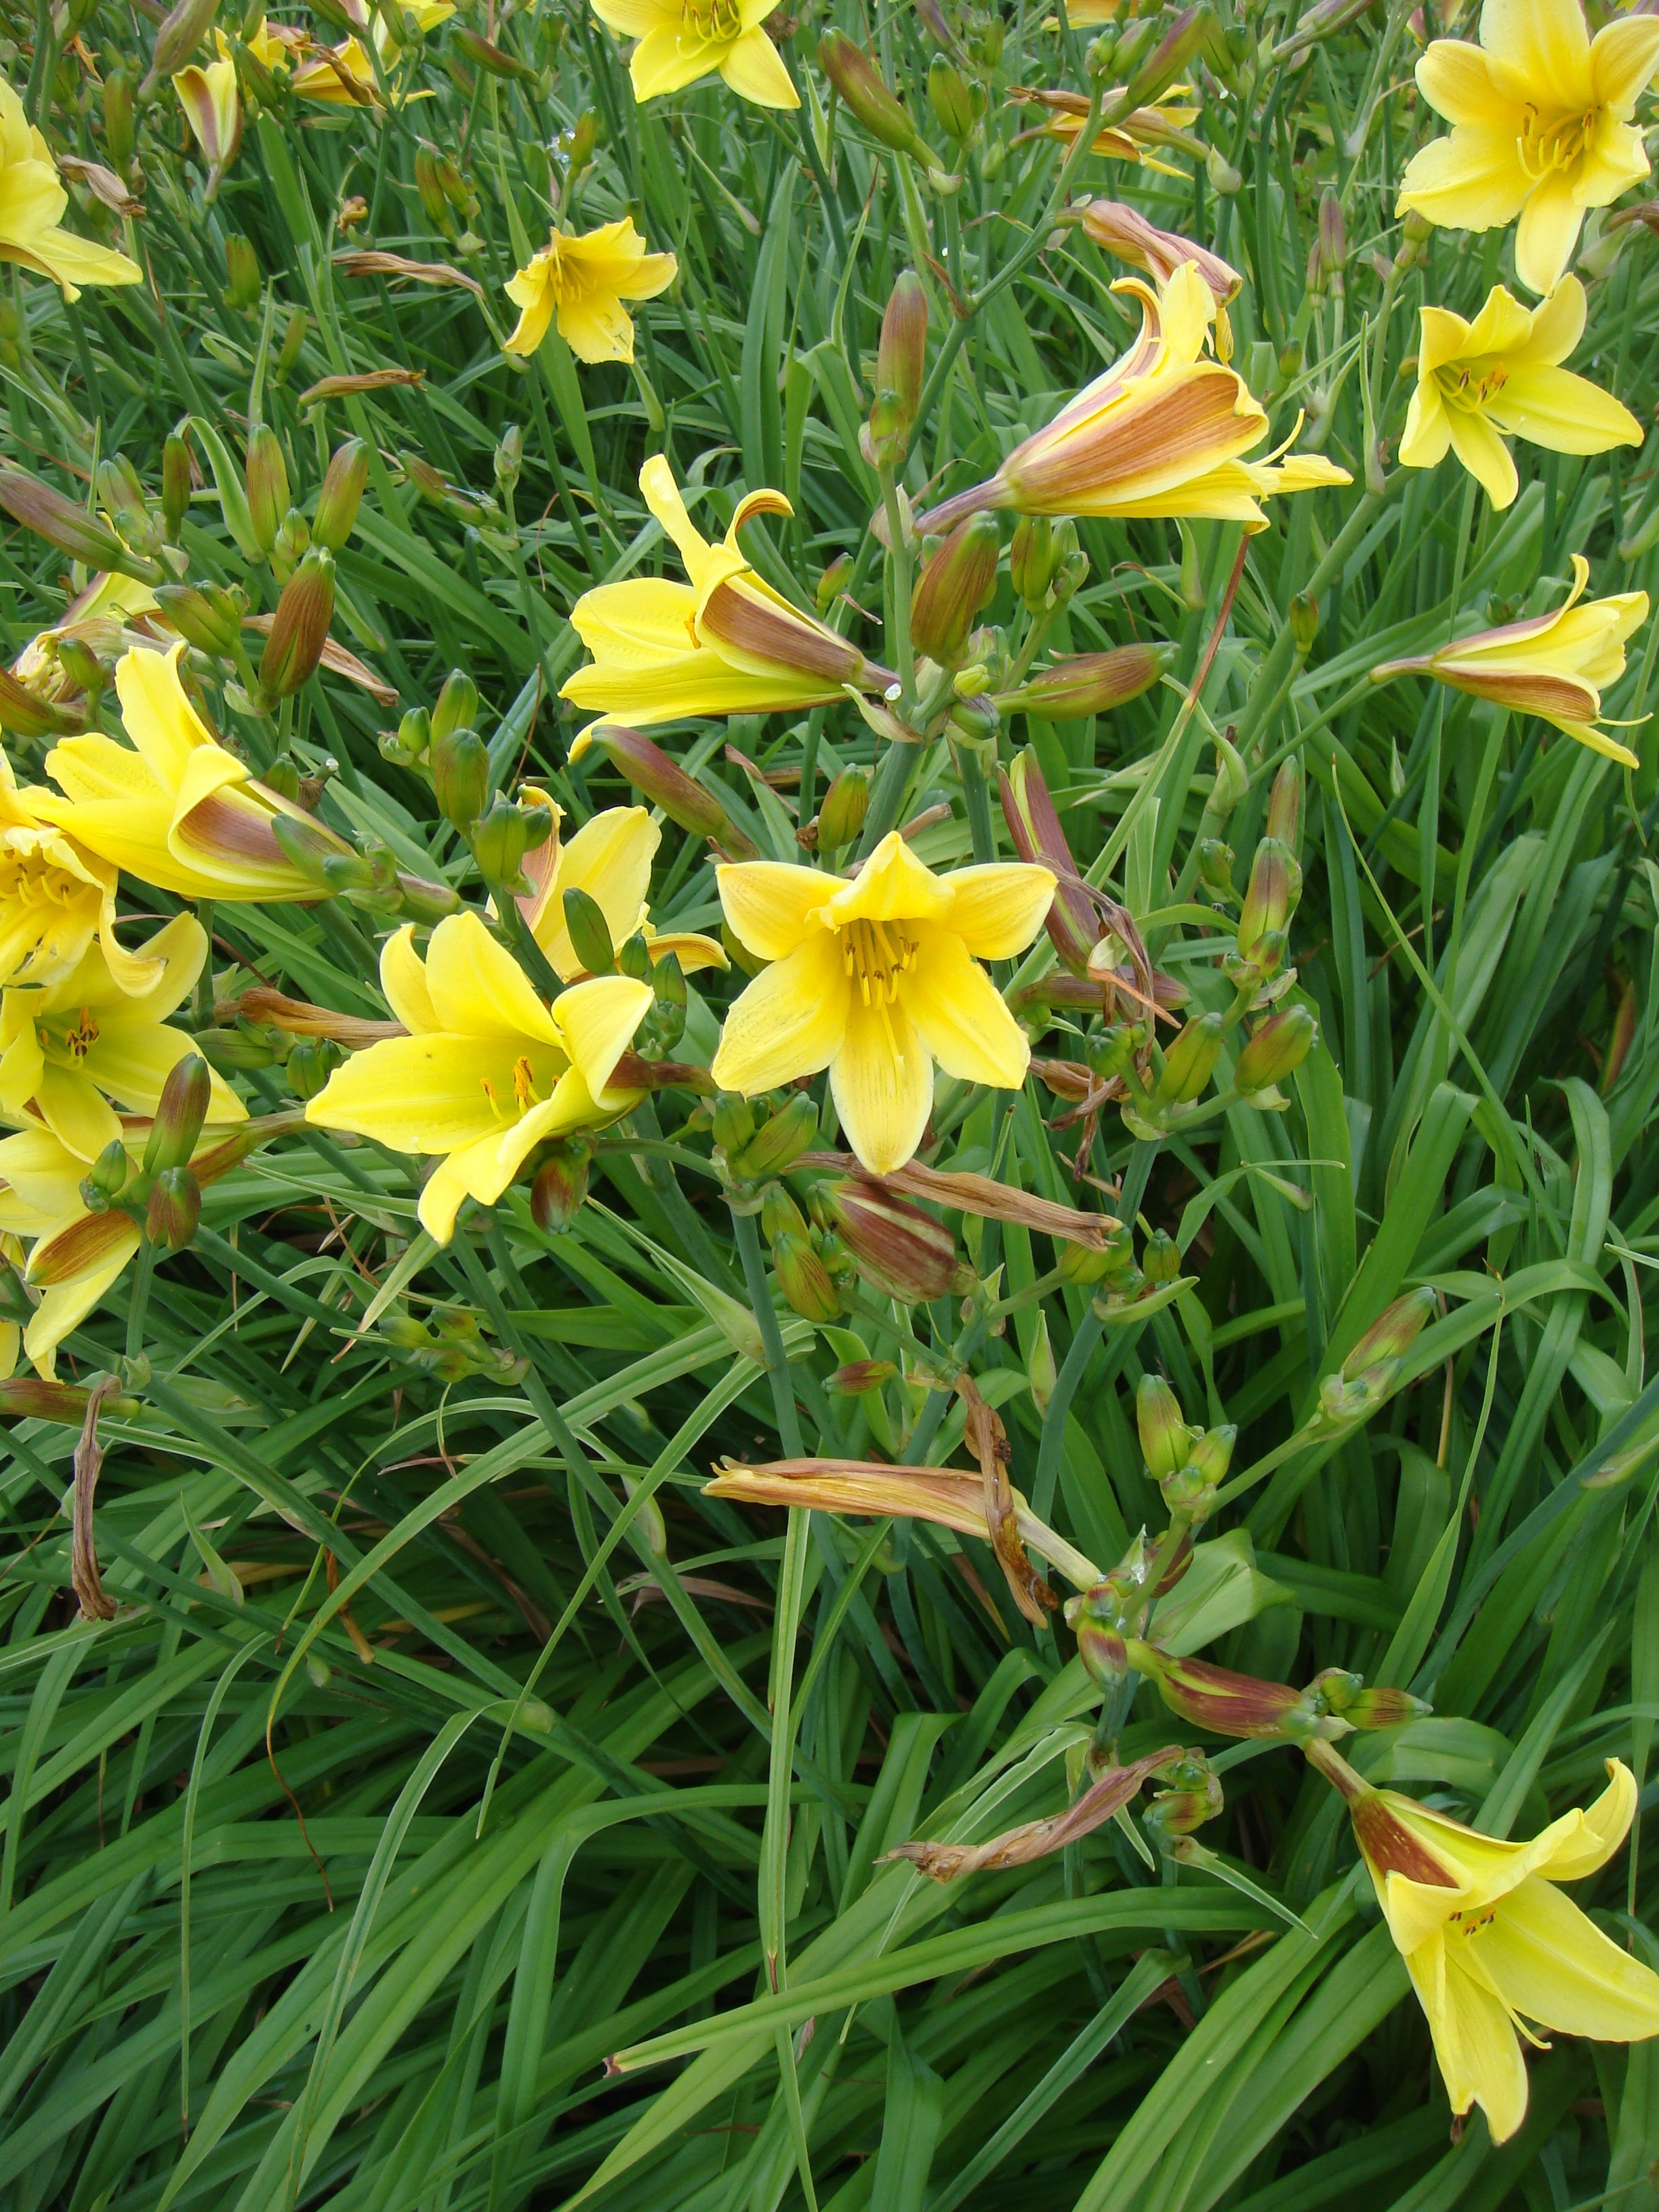 Hemerocallis Golden Chimes Sprays Of Small Yellow Flowers With